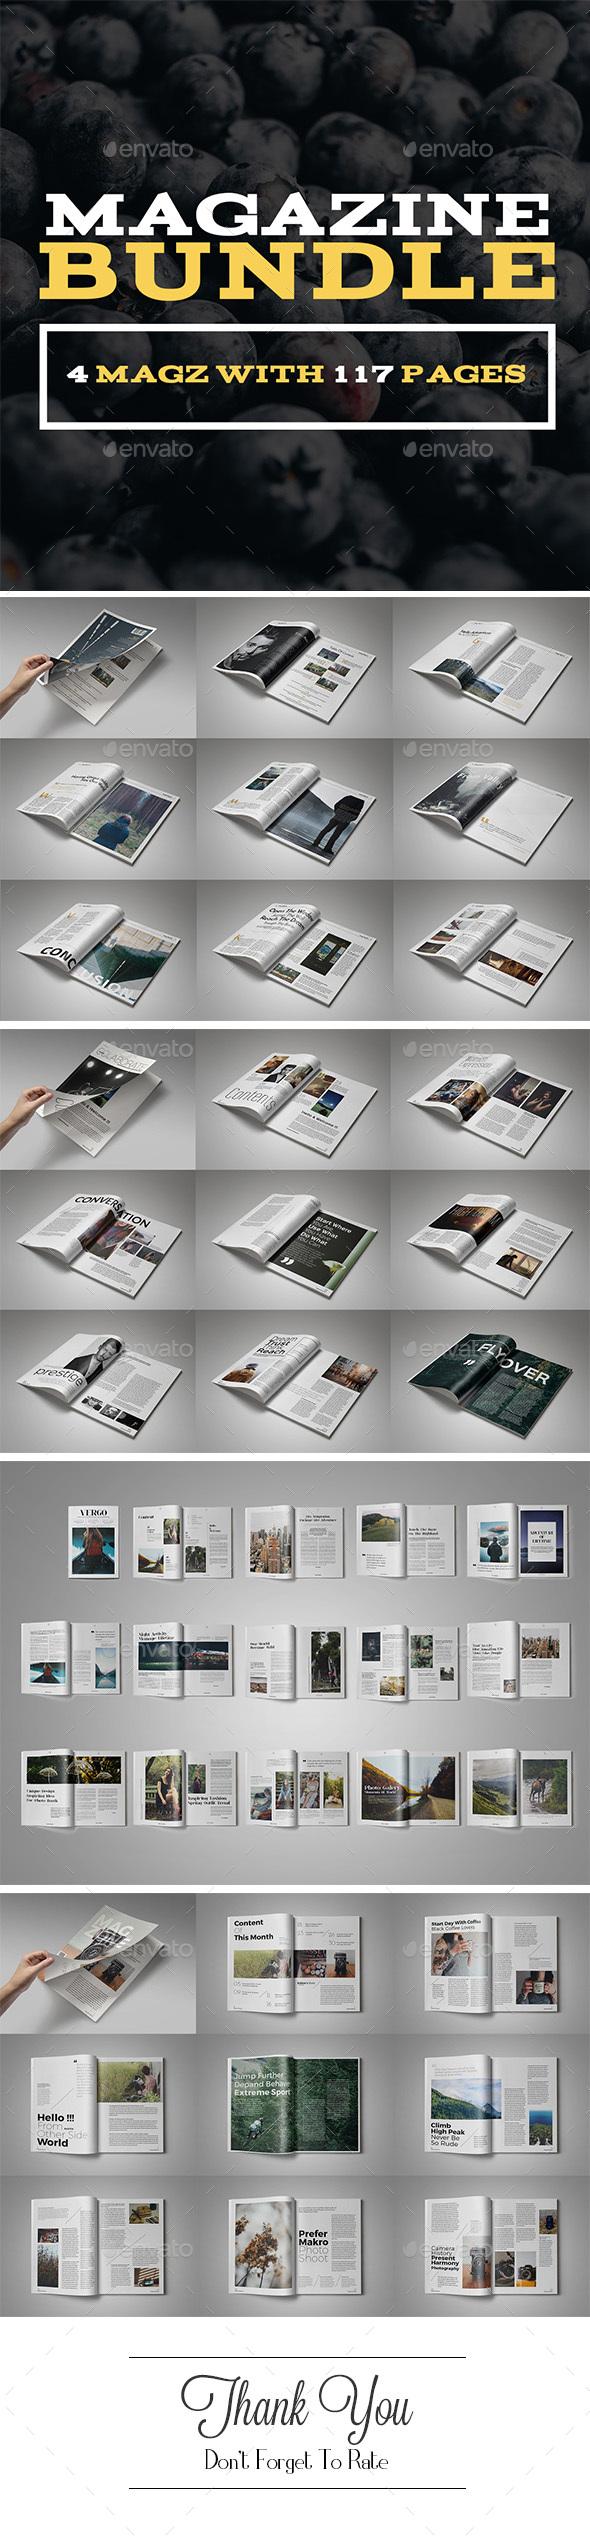 Magazine Bundle Vol.1 - Magazines Print Templates